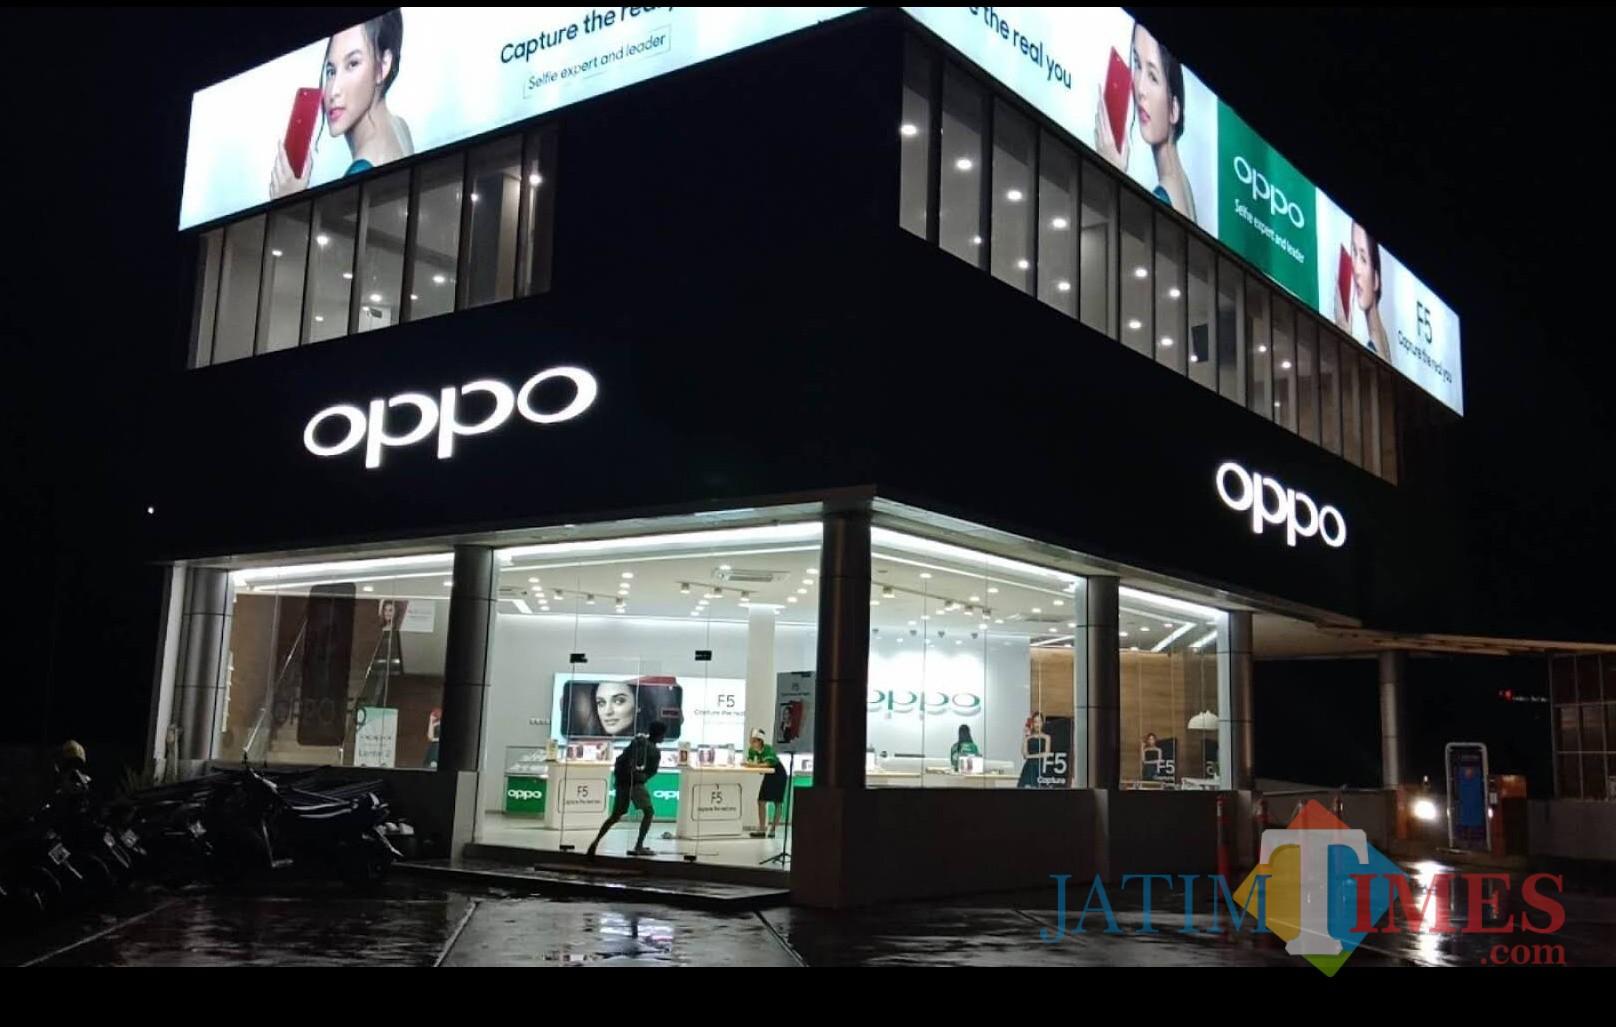 Kantor pemasaran dan service center Oppo Malang di Jalan Soekarno-Hatta, Kota Malang. (Dok. MalangTIMES)